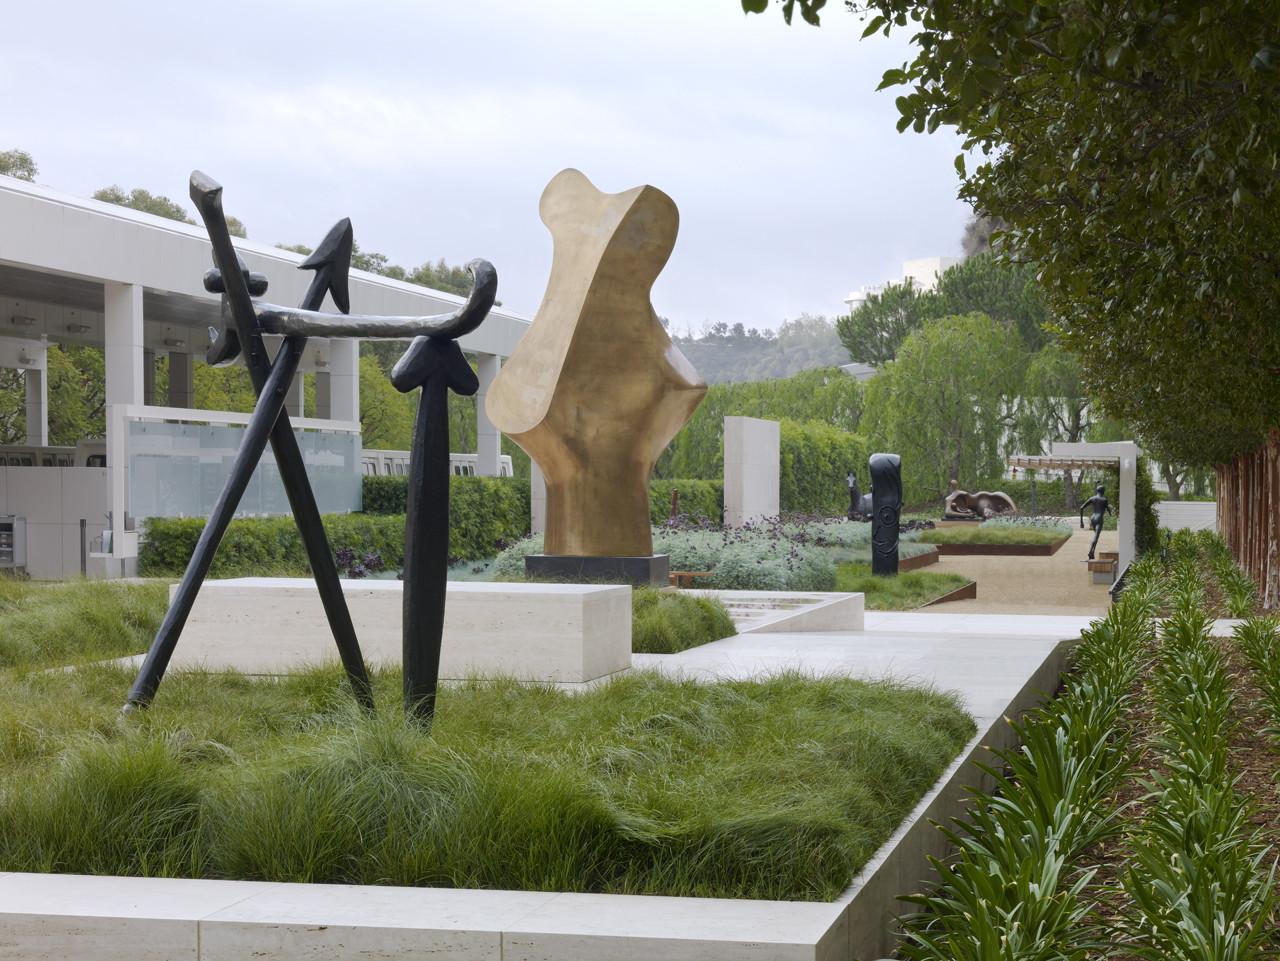 Gallery Of Fran And Ray Stark Sculpture Garden J Paul